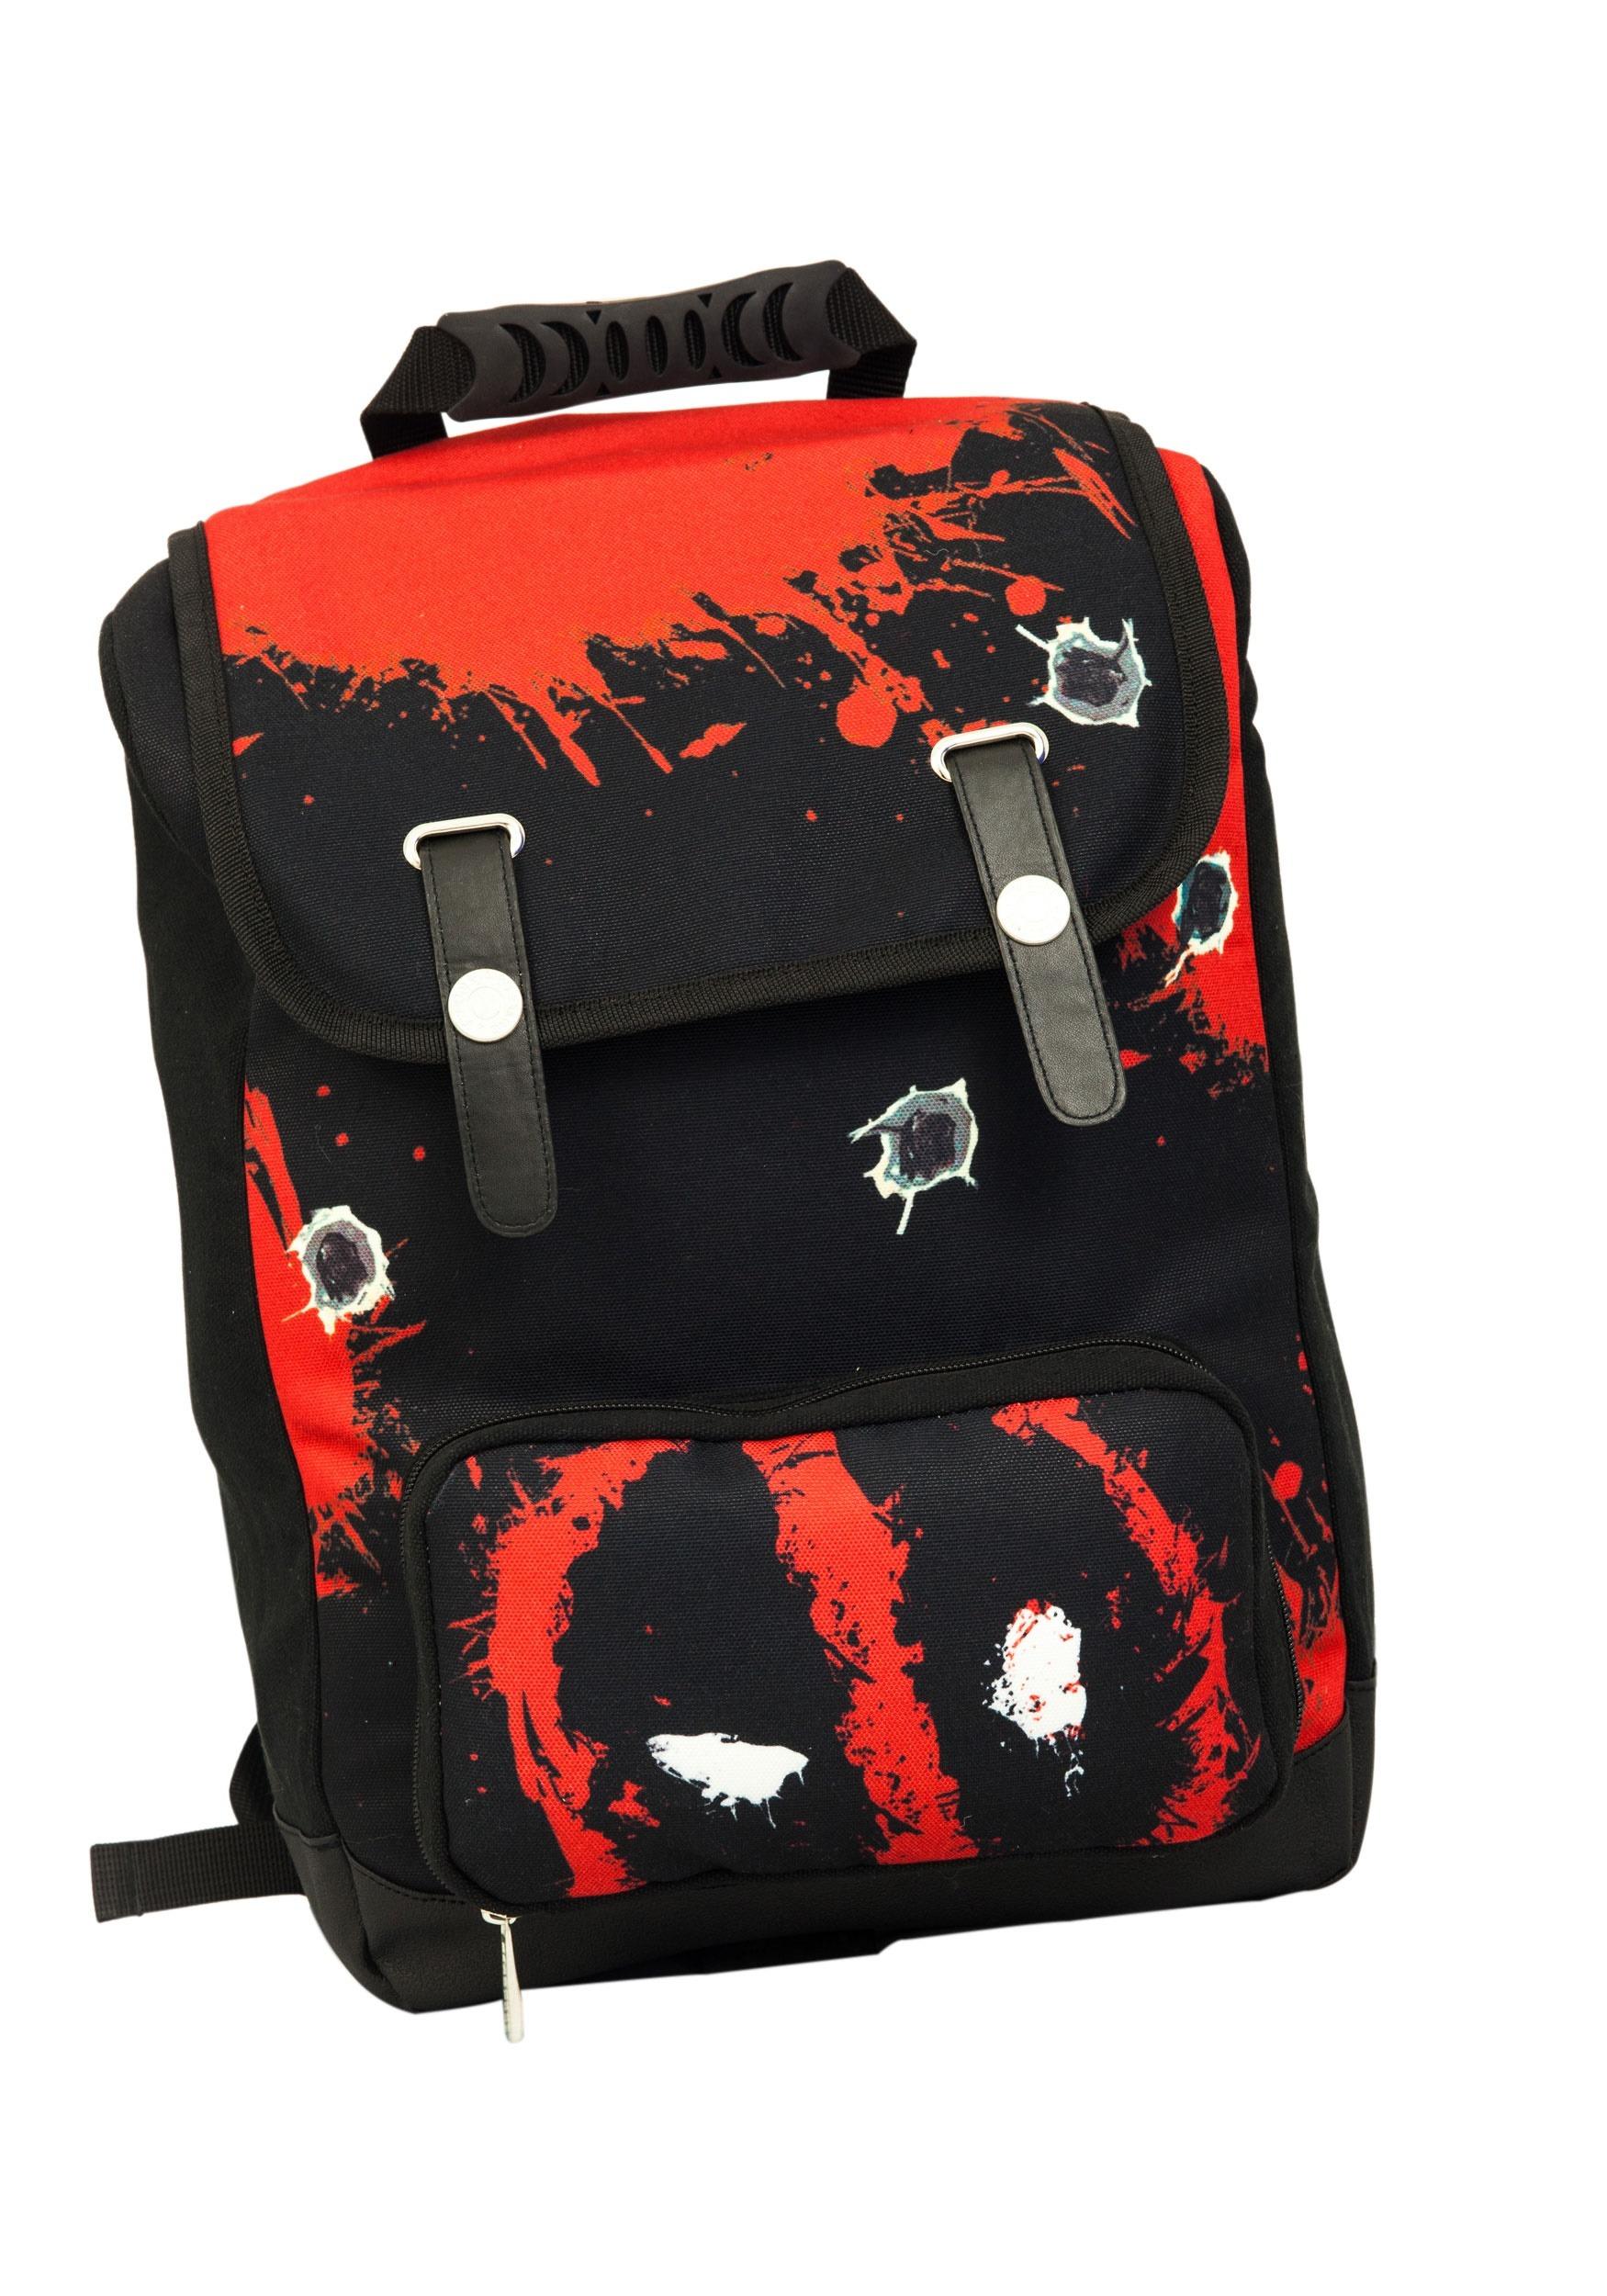 Deadpool_Backpack